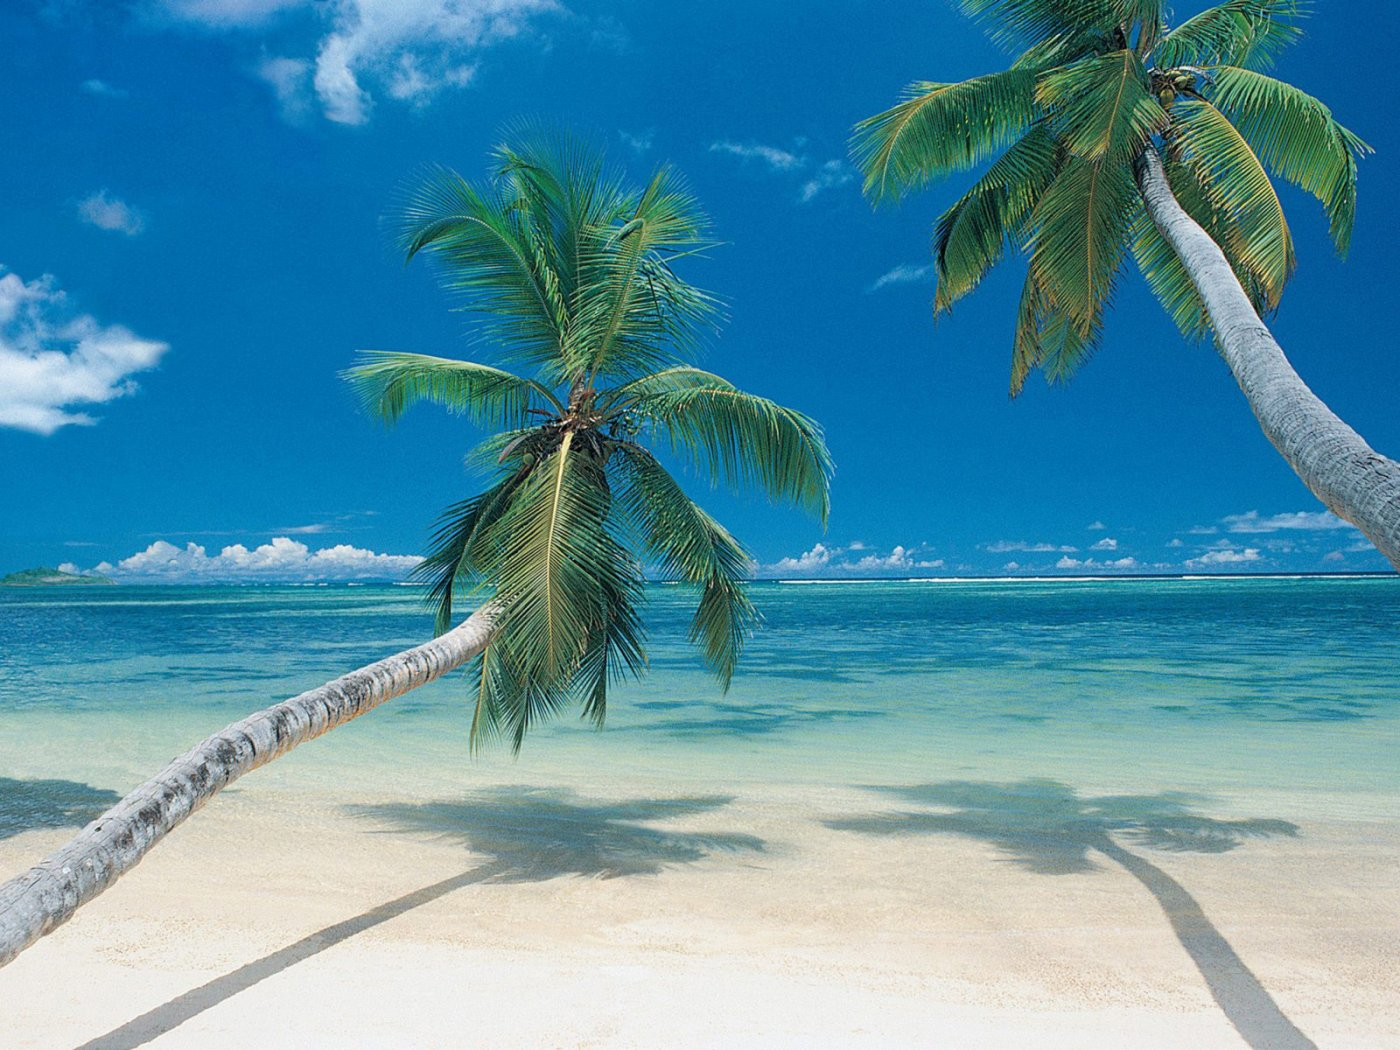 URL httpwwwsmscscomphotobeautiful palm tree wallpaper10html 1400x1050